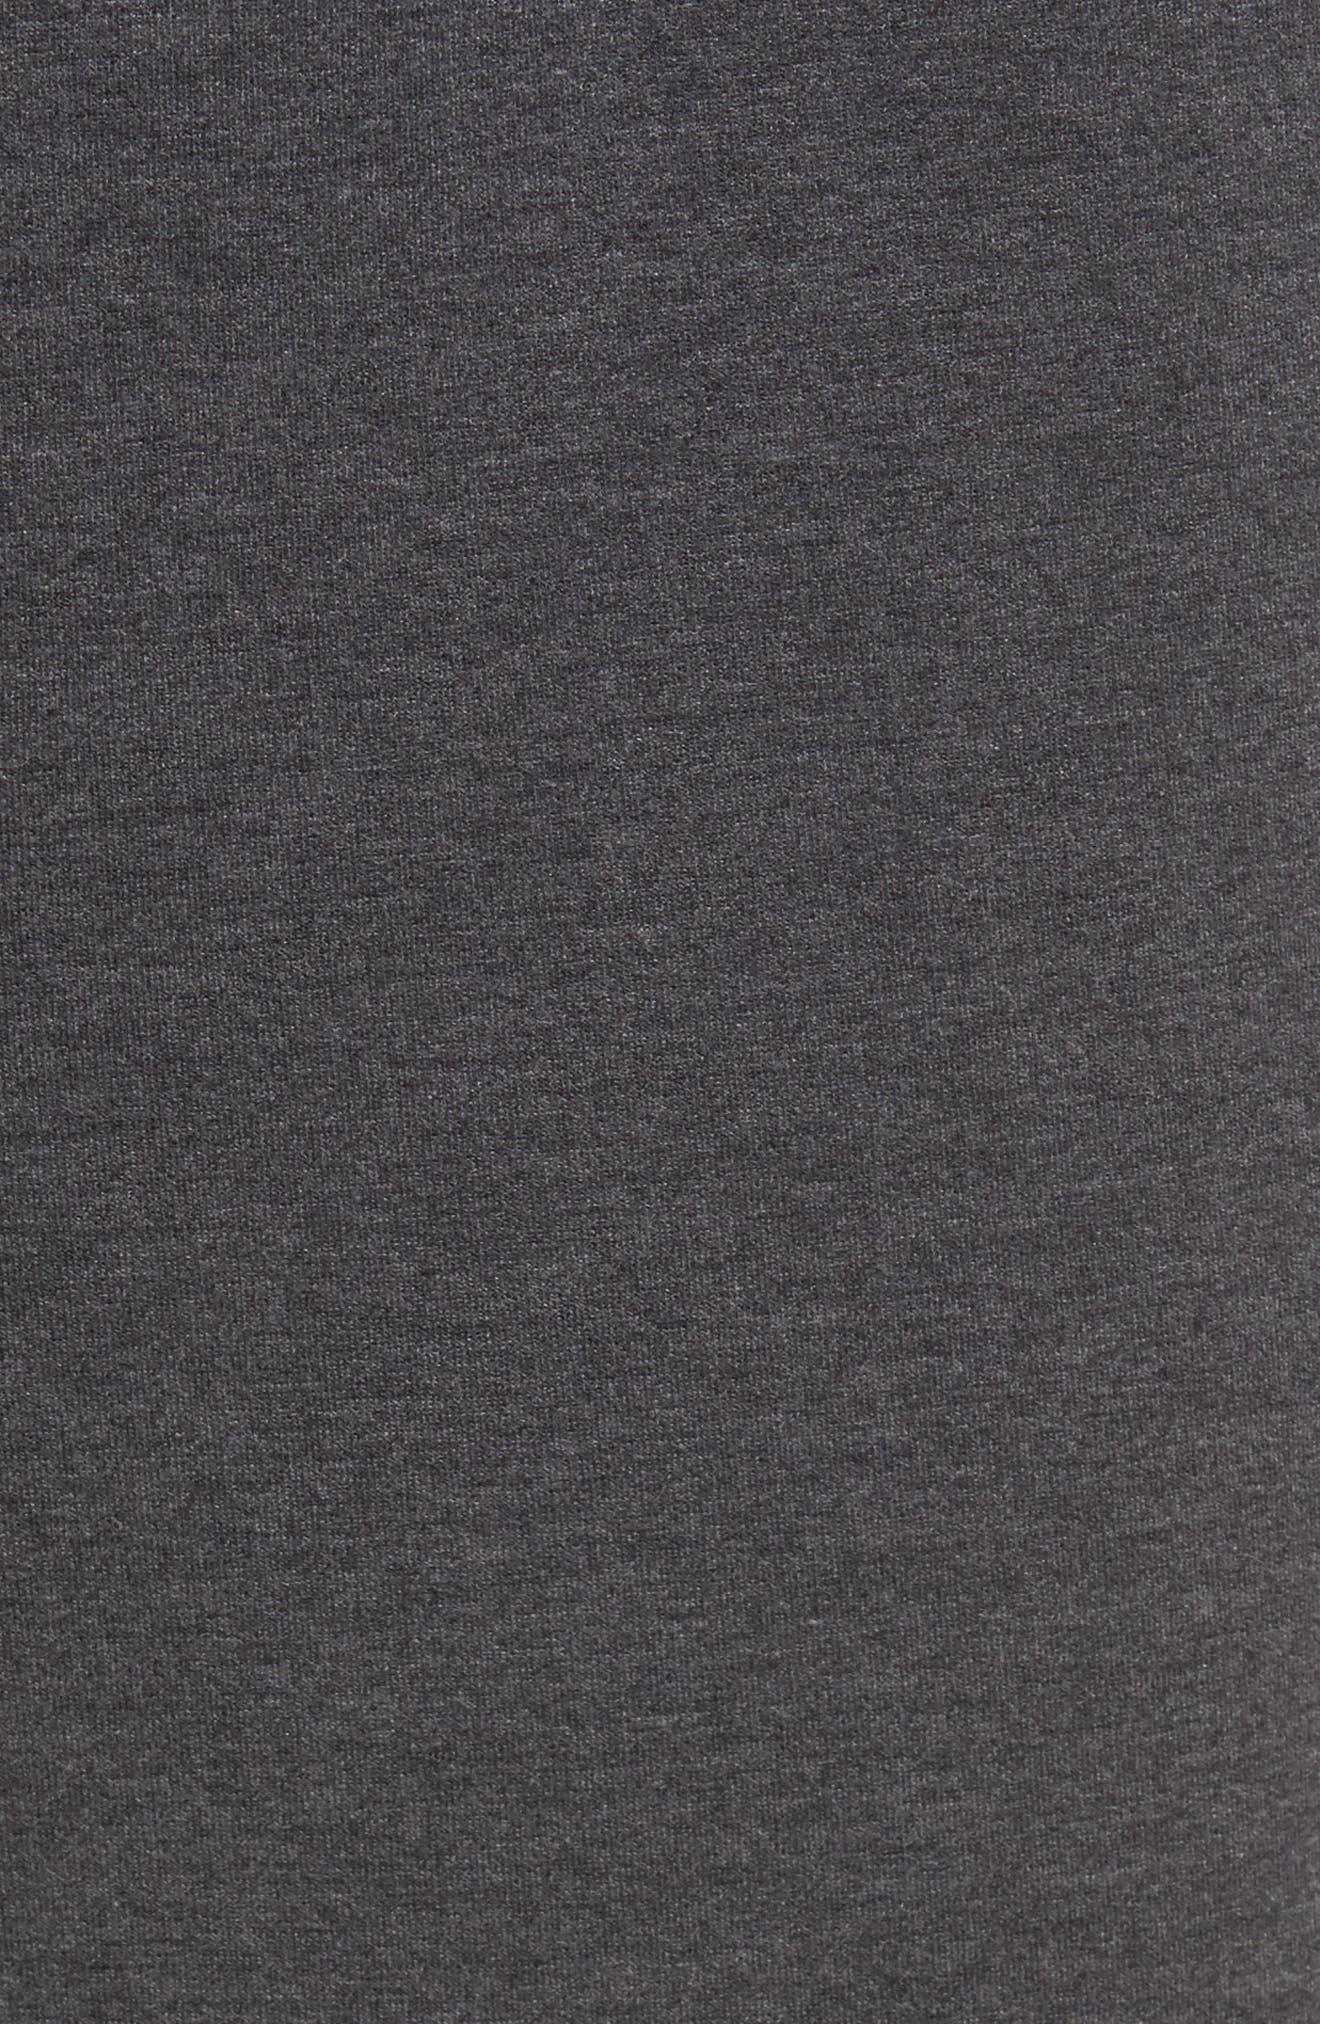 Knit Lounge Pants,                             Alternate thumbnail 5, color,                             Charcoal Heather